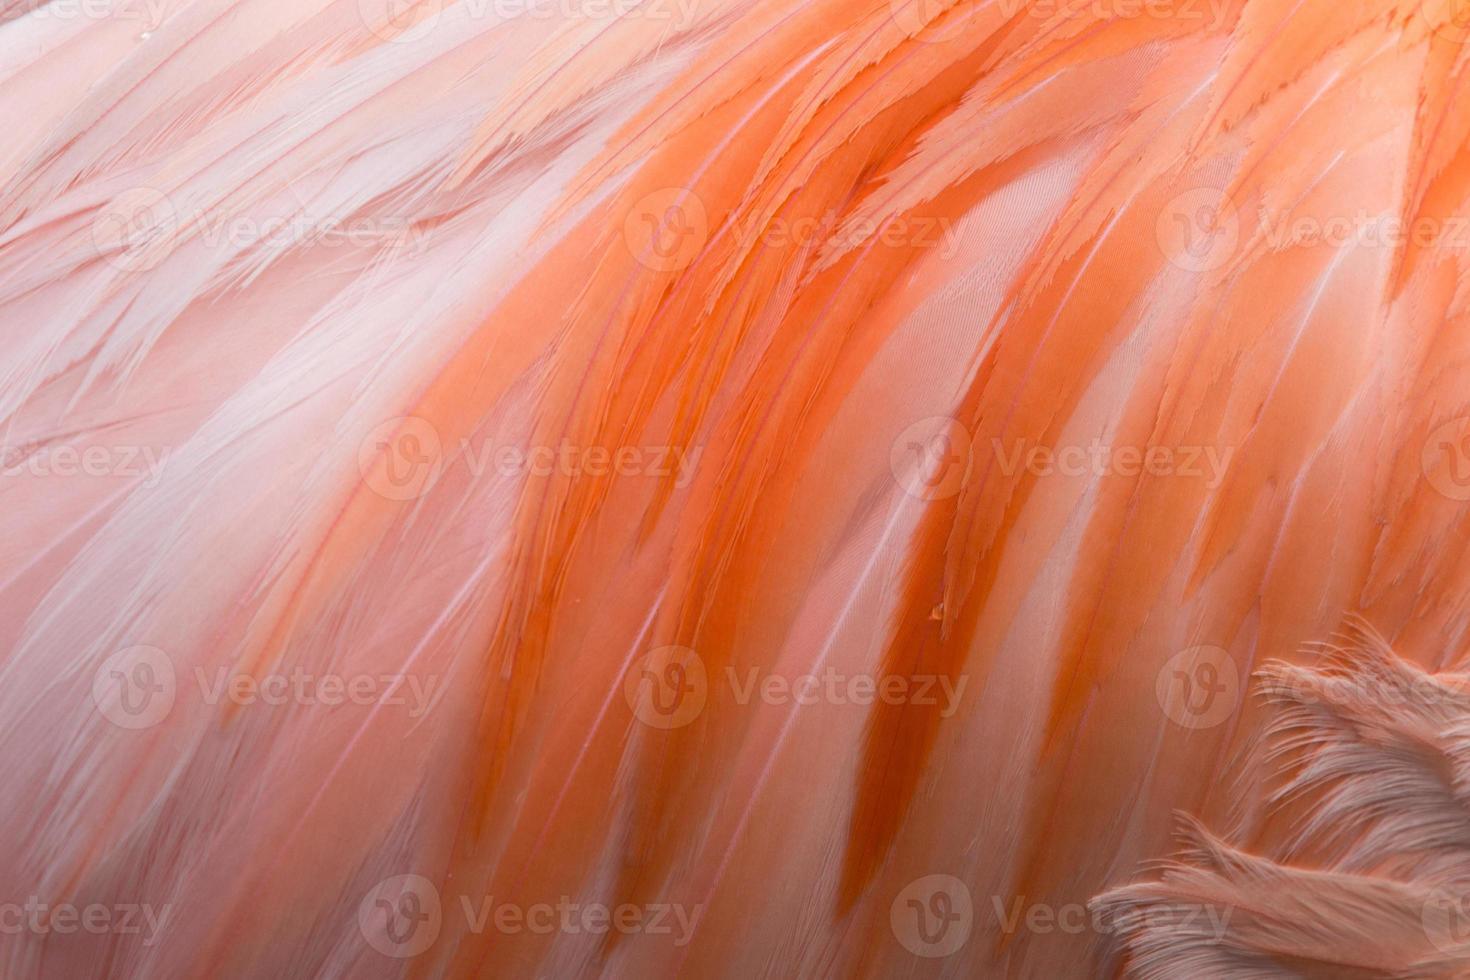 detalj av flamingo's fjäder foto